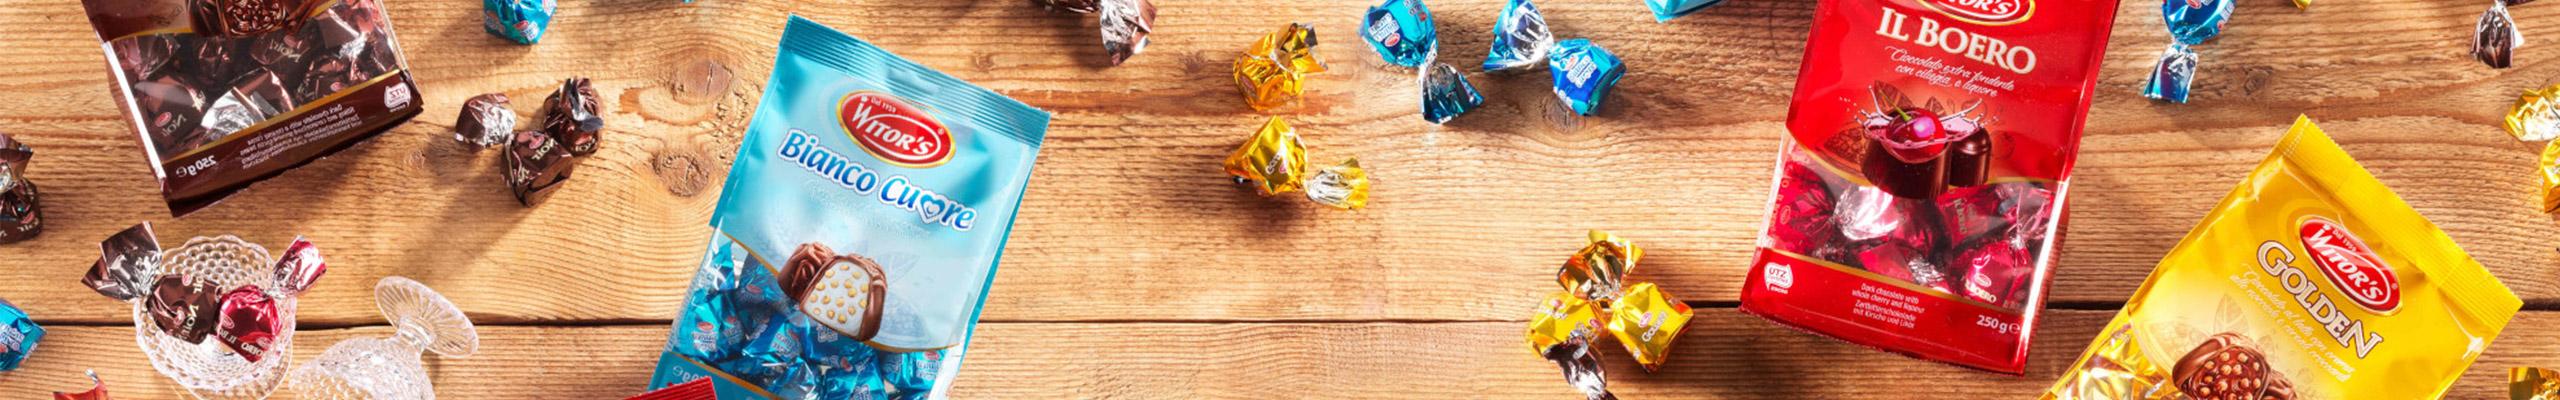 banner τυλιχτά σοκολατάκια